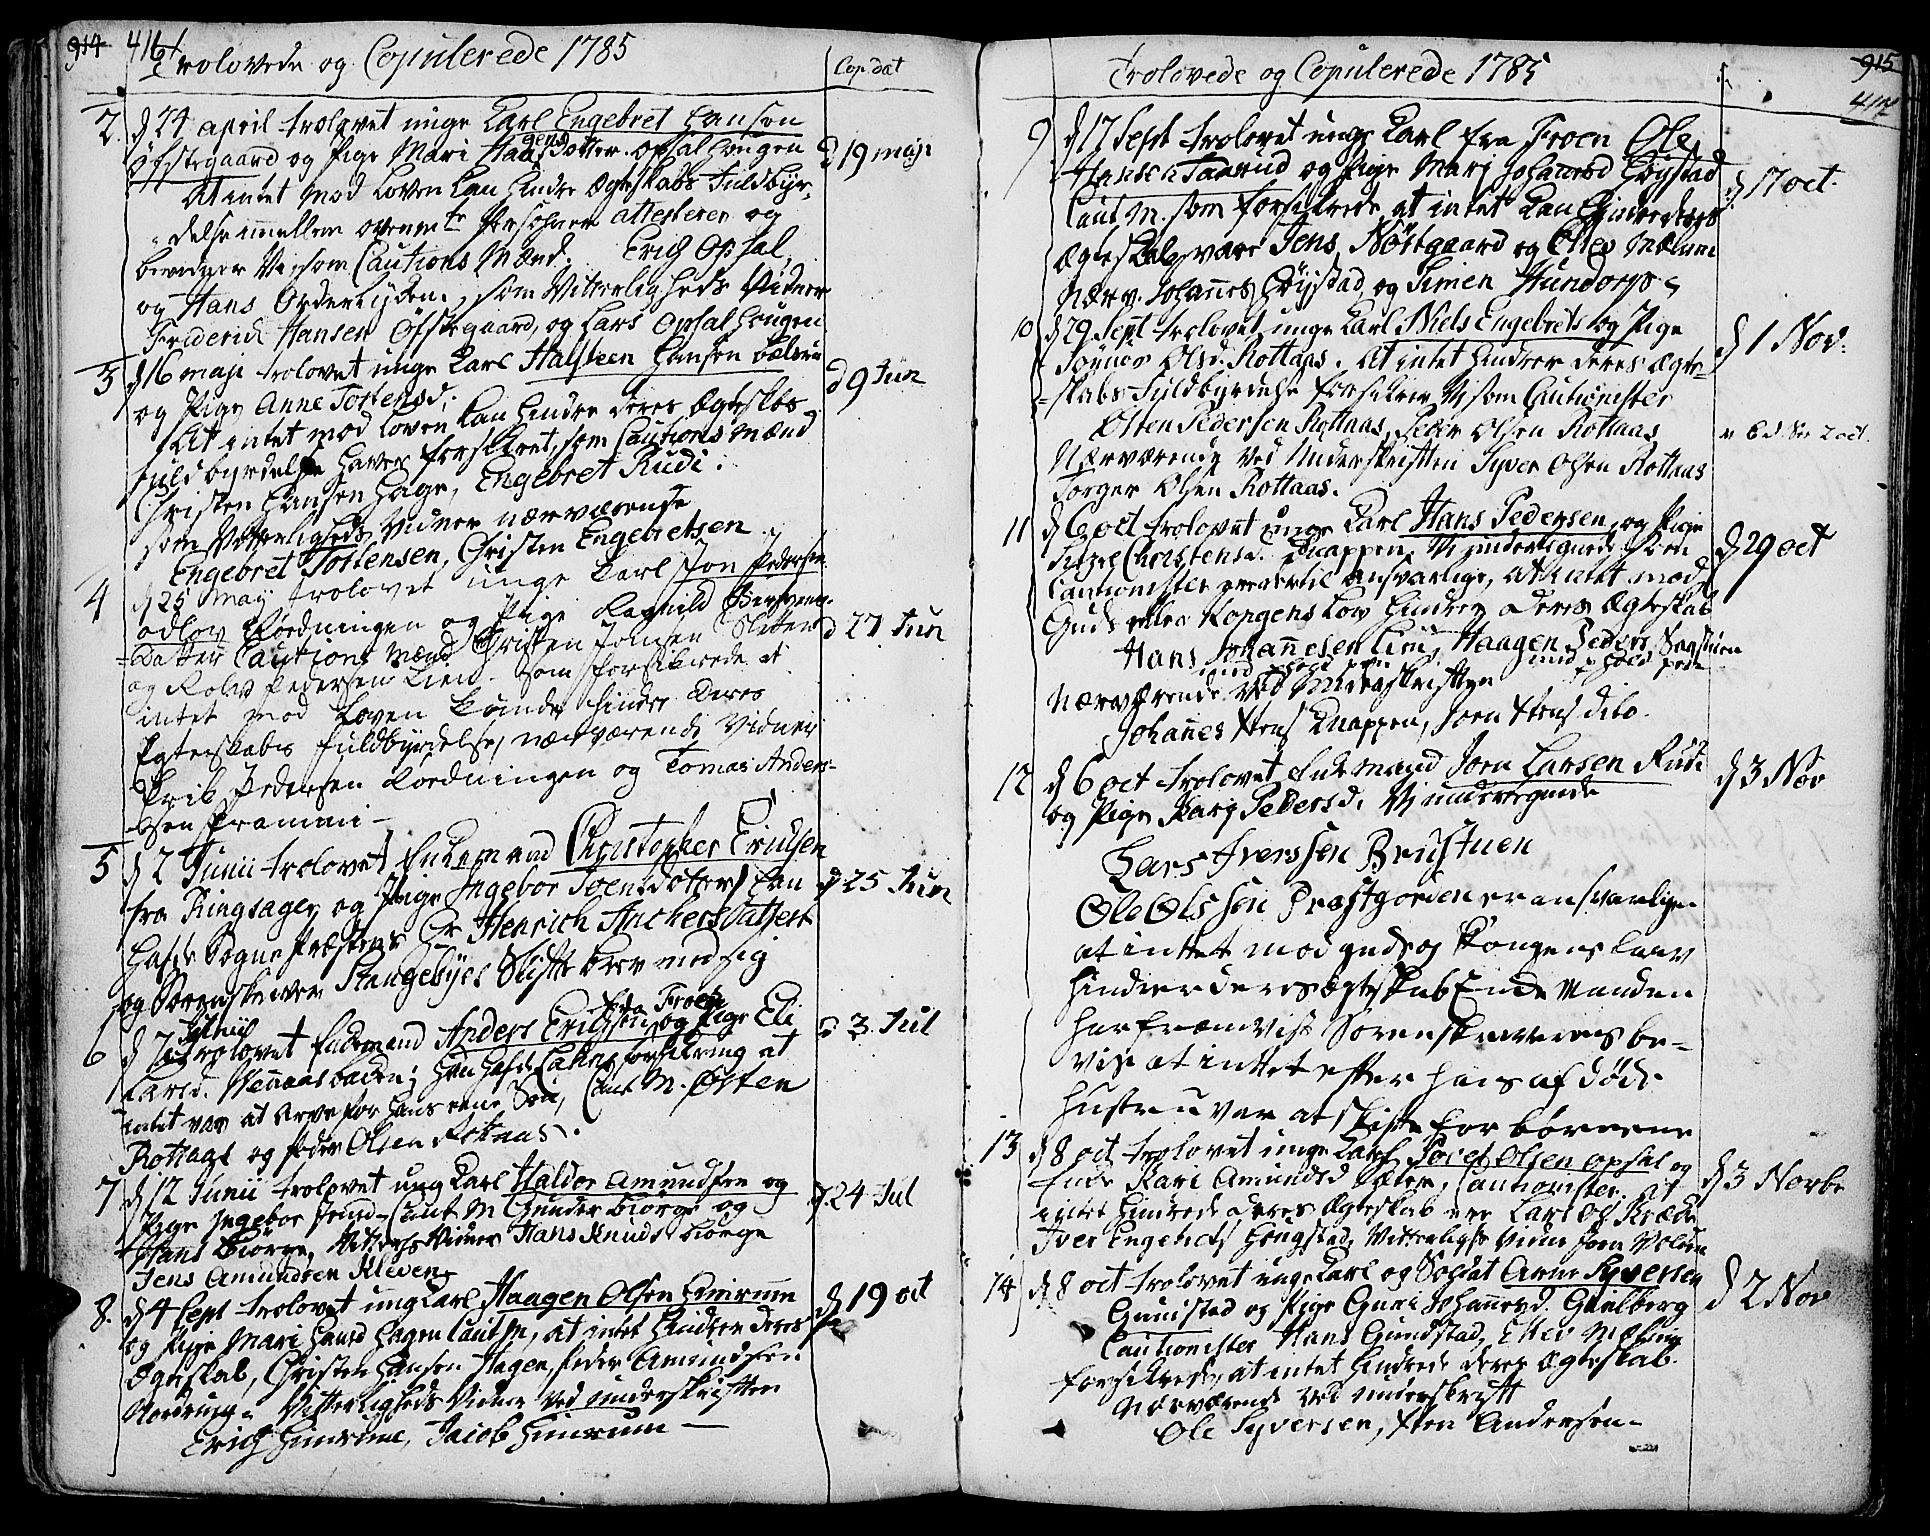 SAH, Ringebu prestekontor, Ministerialbok nr. 3, 1781-1820, s. 416-417